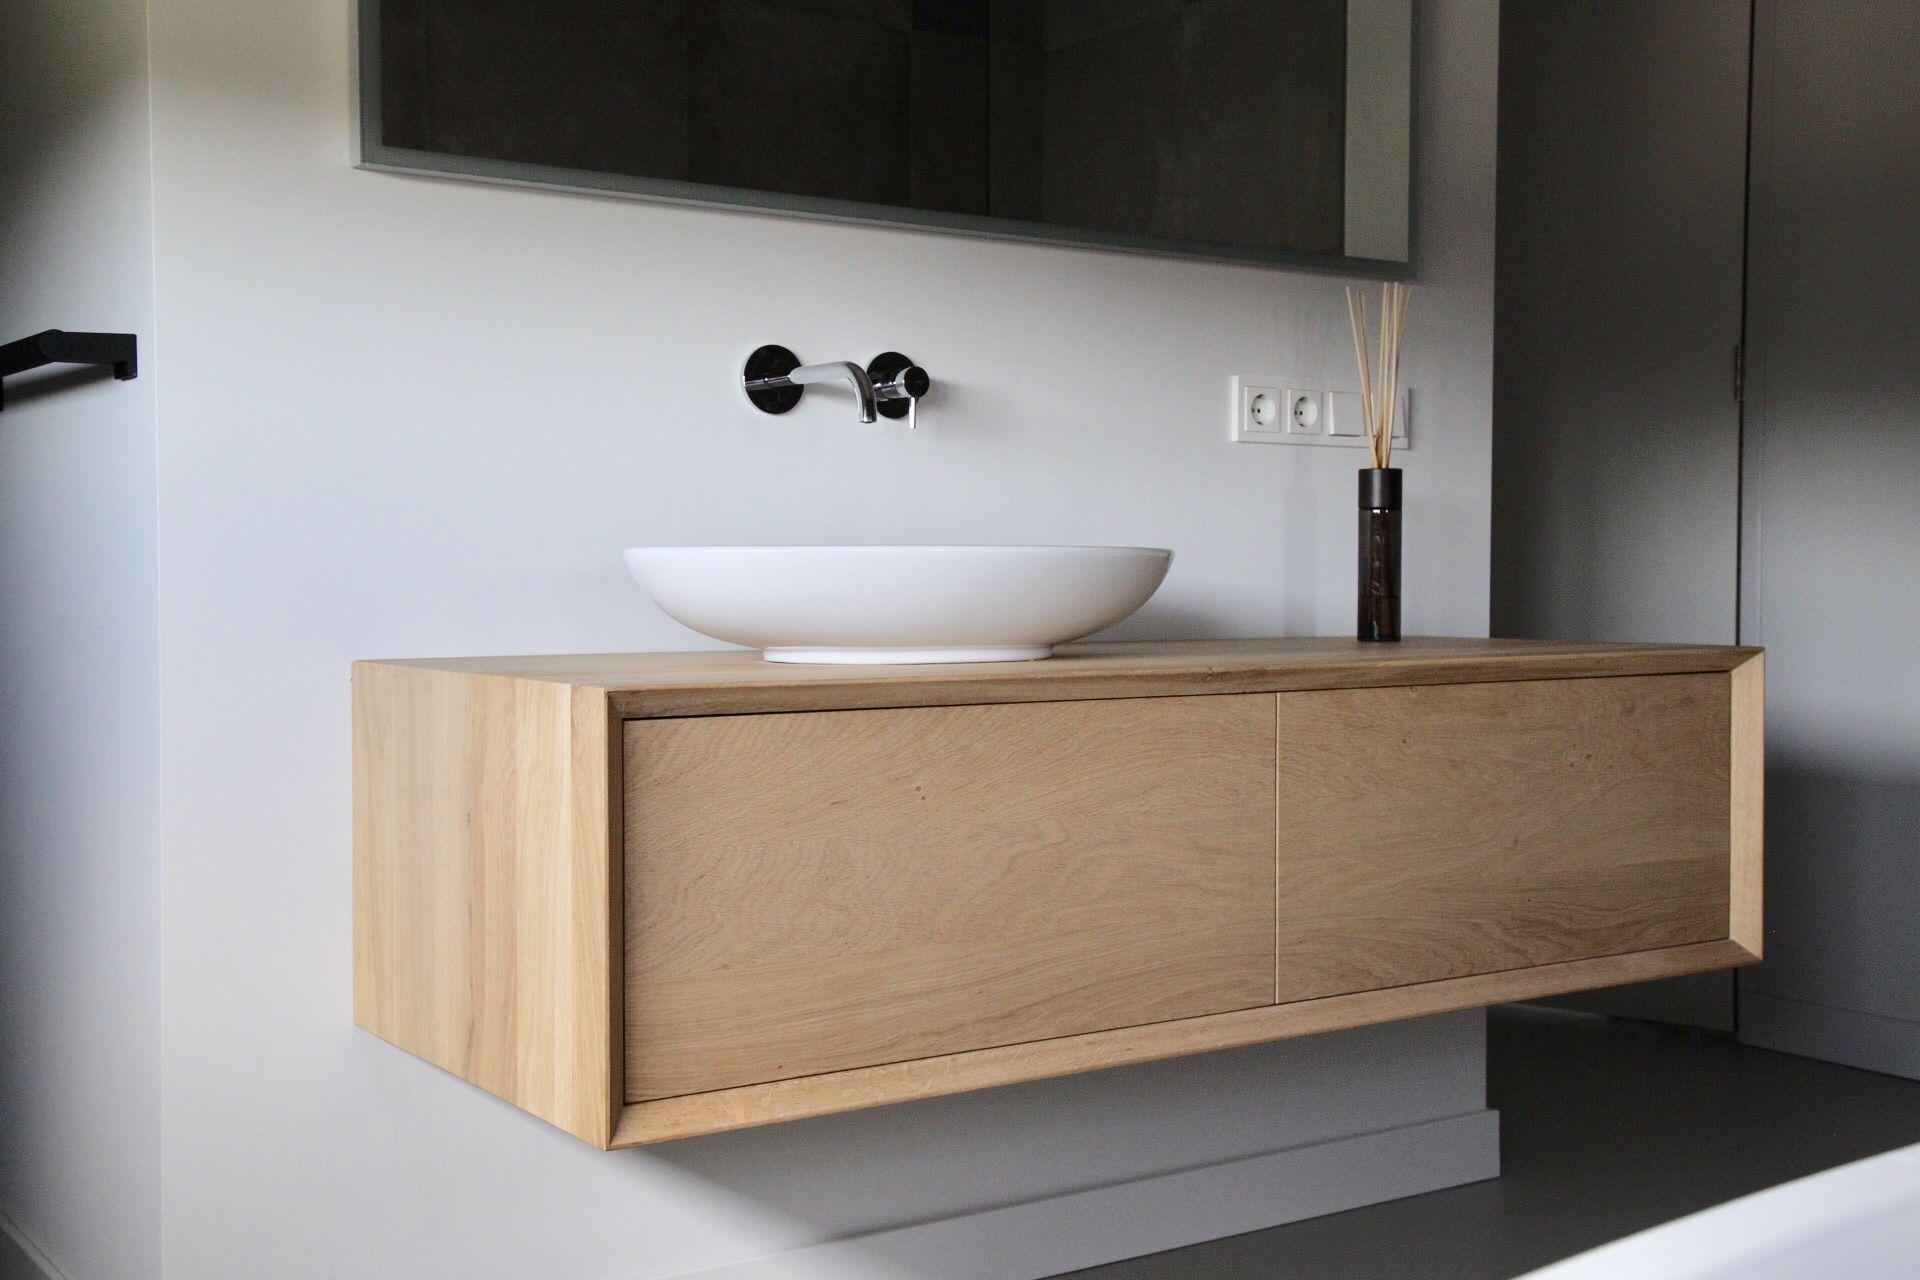 Badkamermeubel Op Maat : Betaalbare eiken badkamermeubel op maat mk maatwerk uit